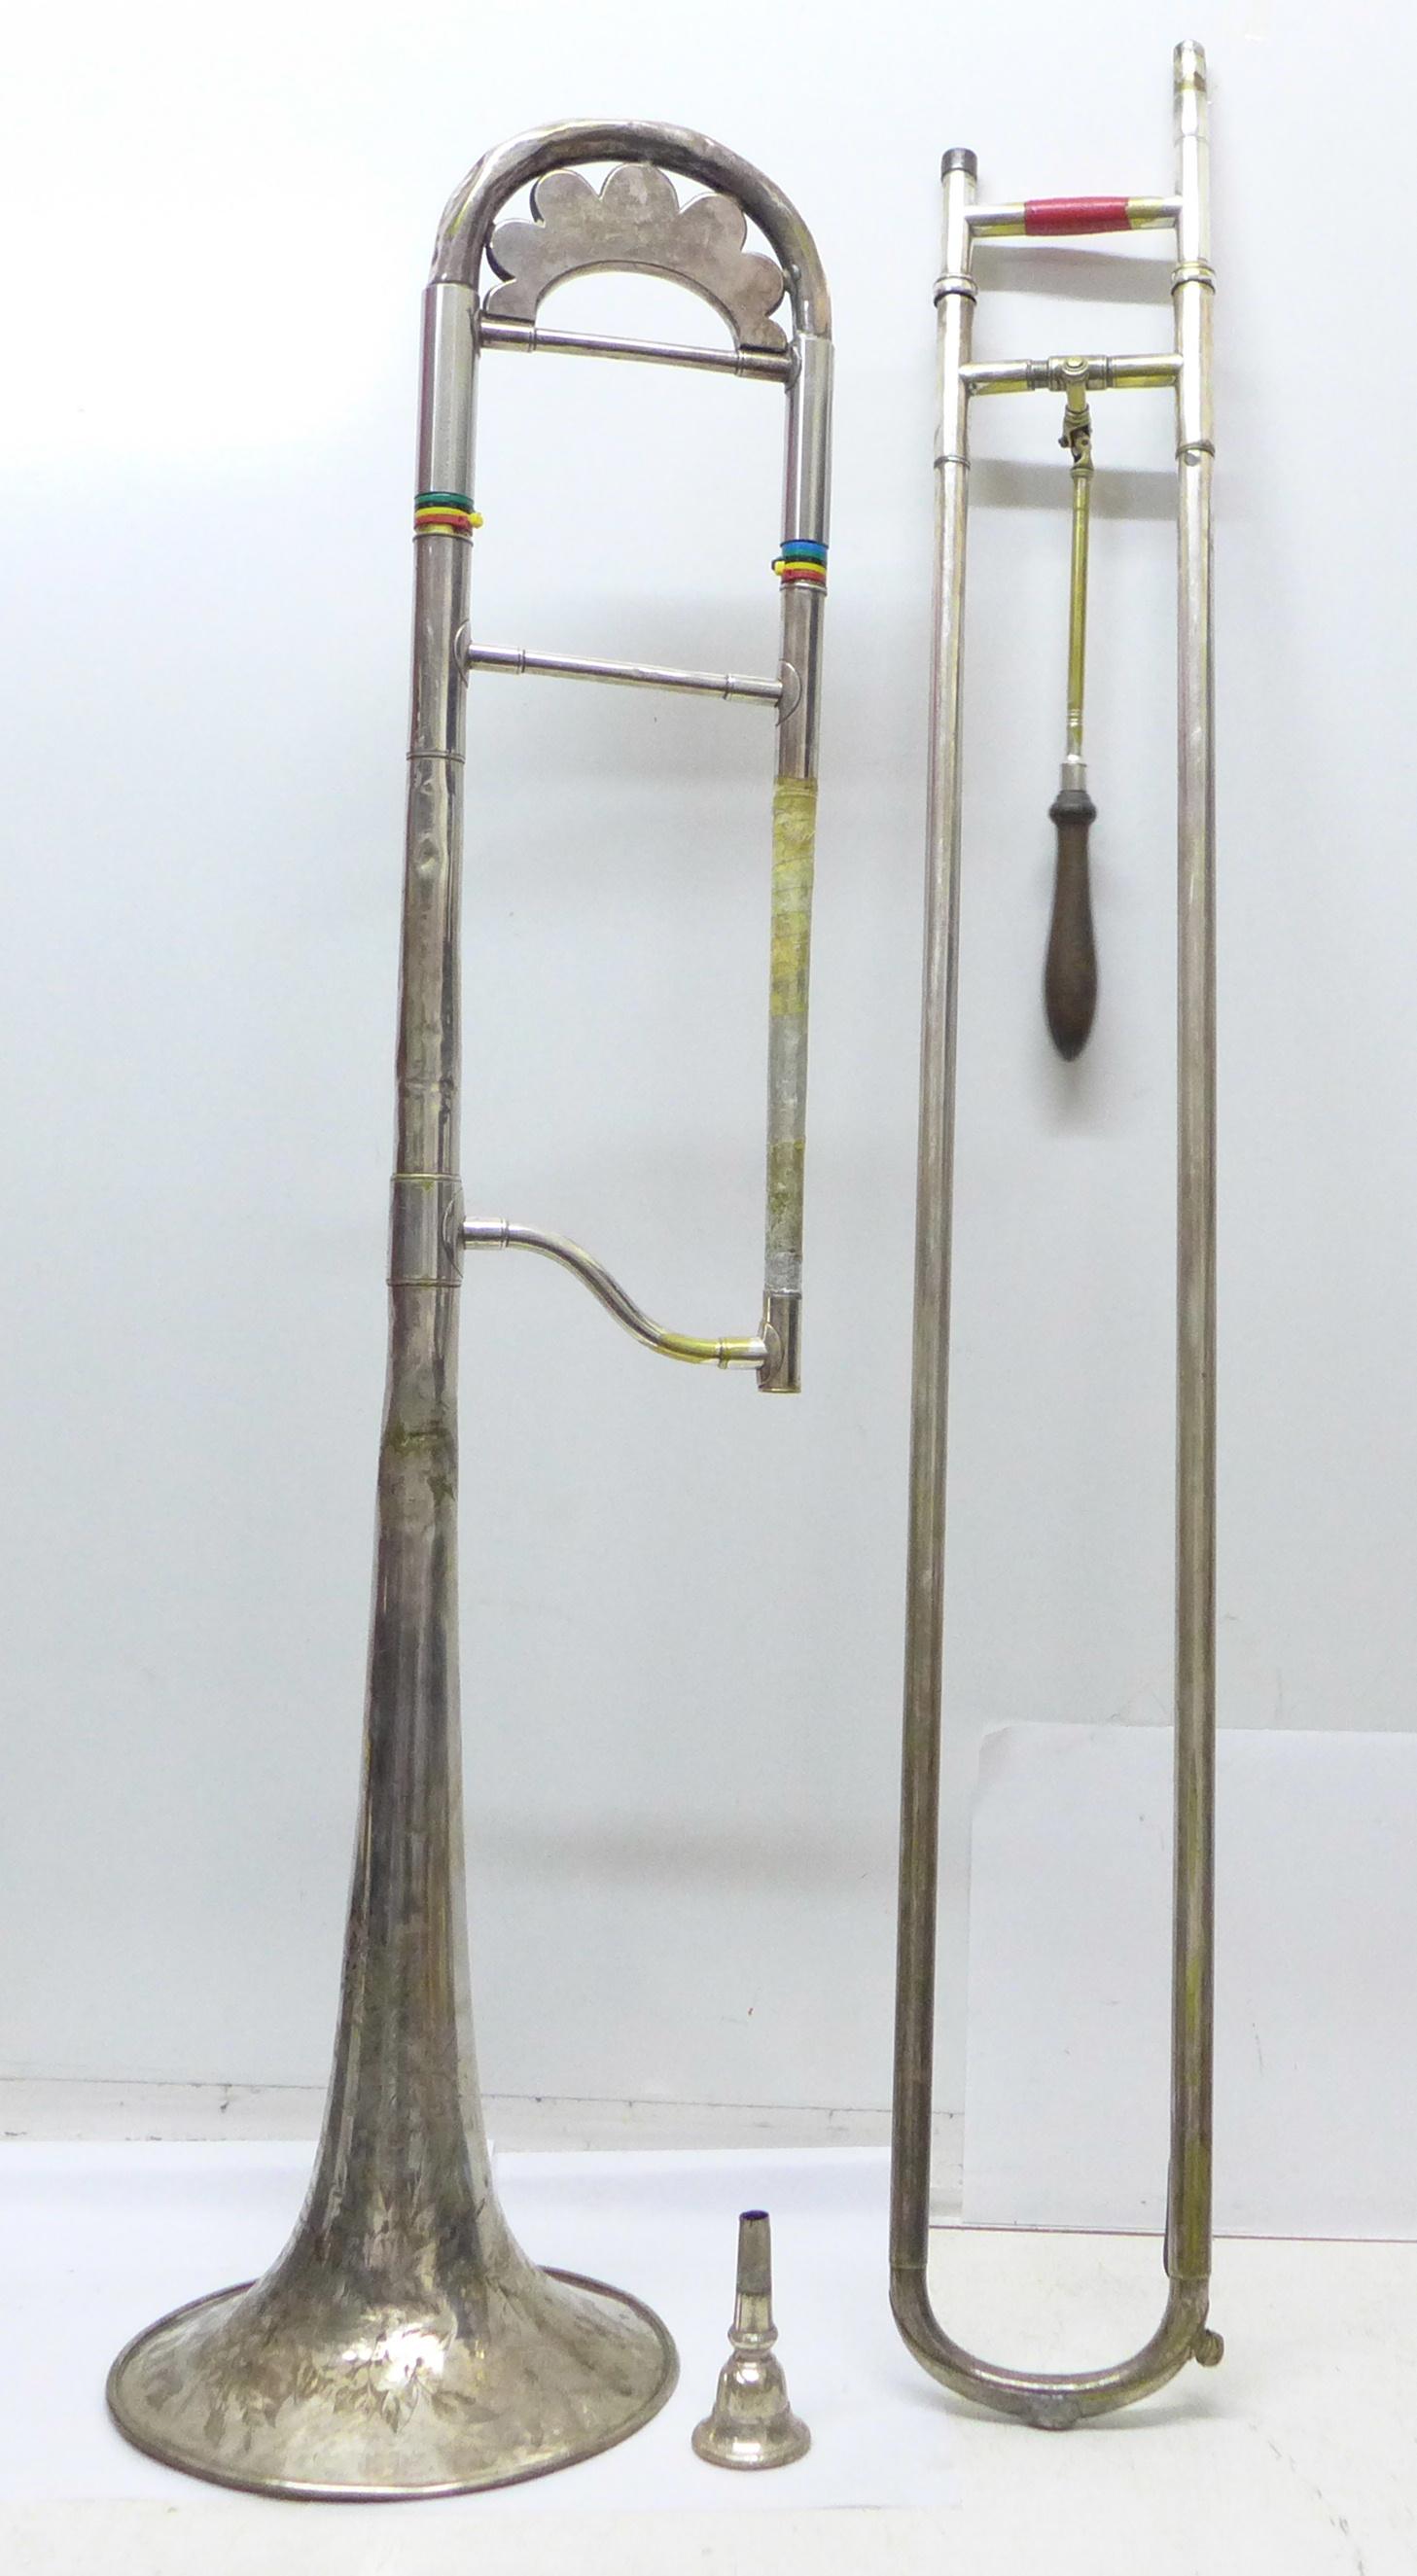 A cased Besson g-flat trombone